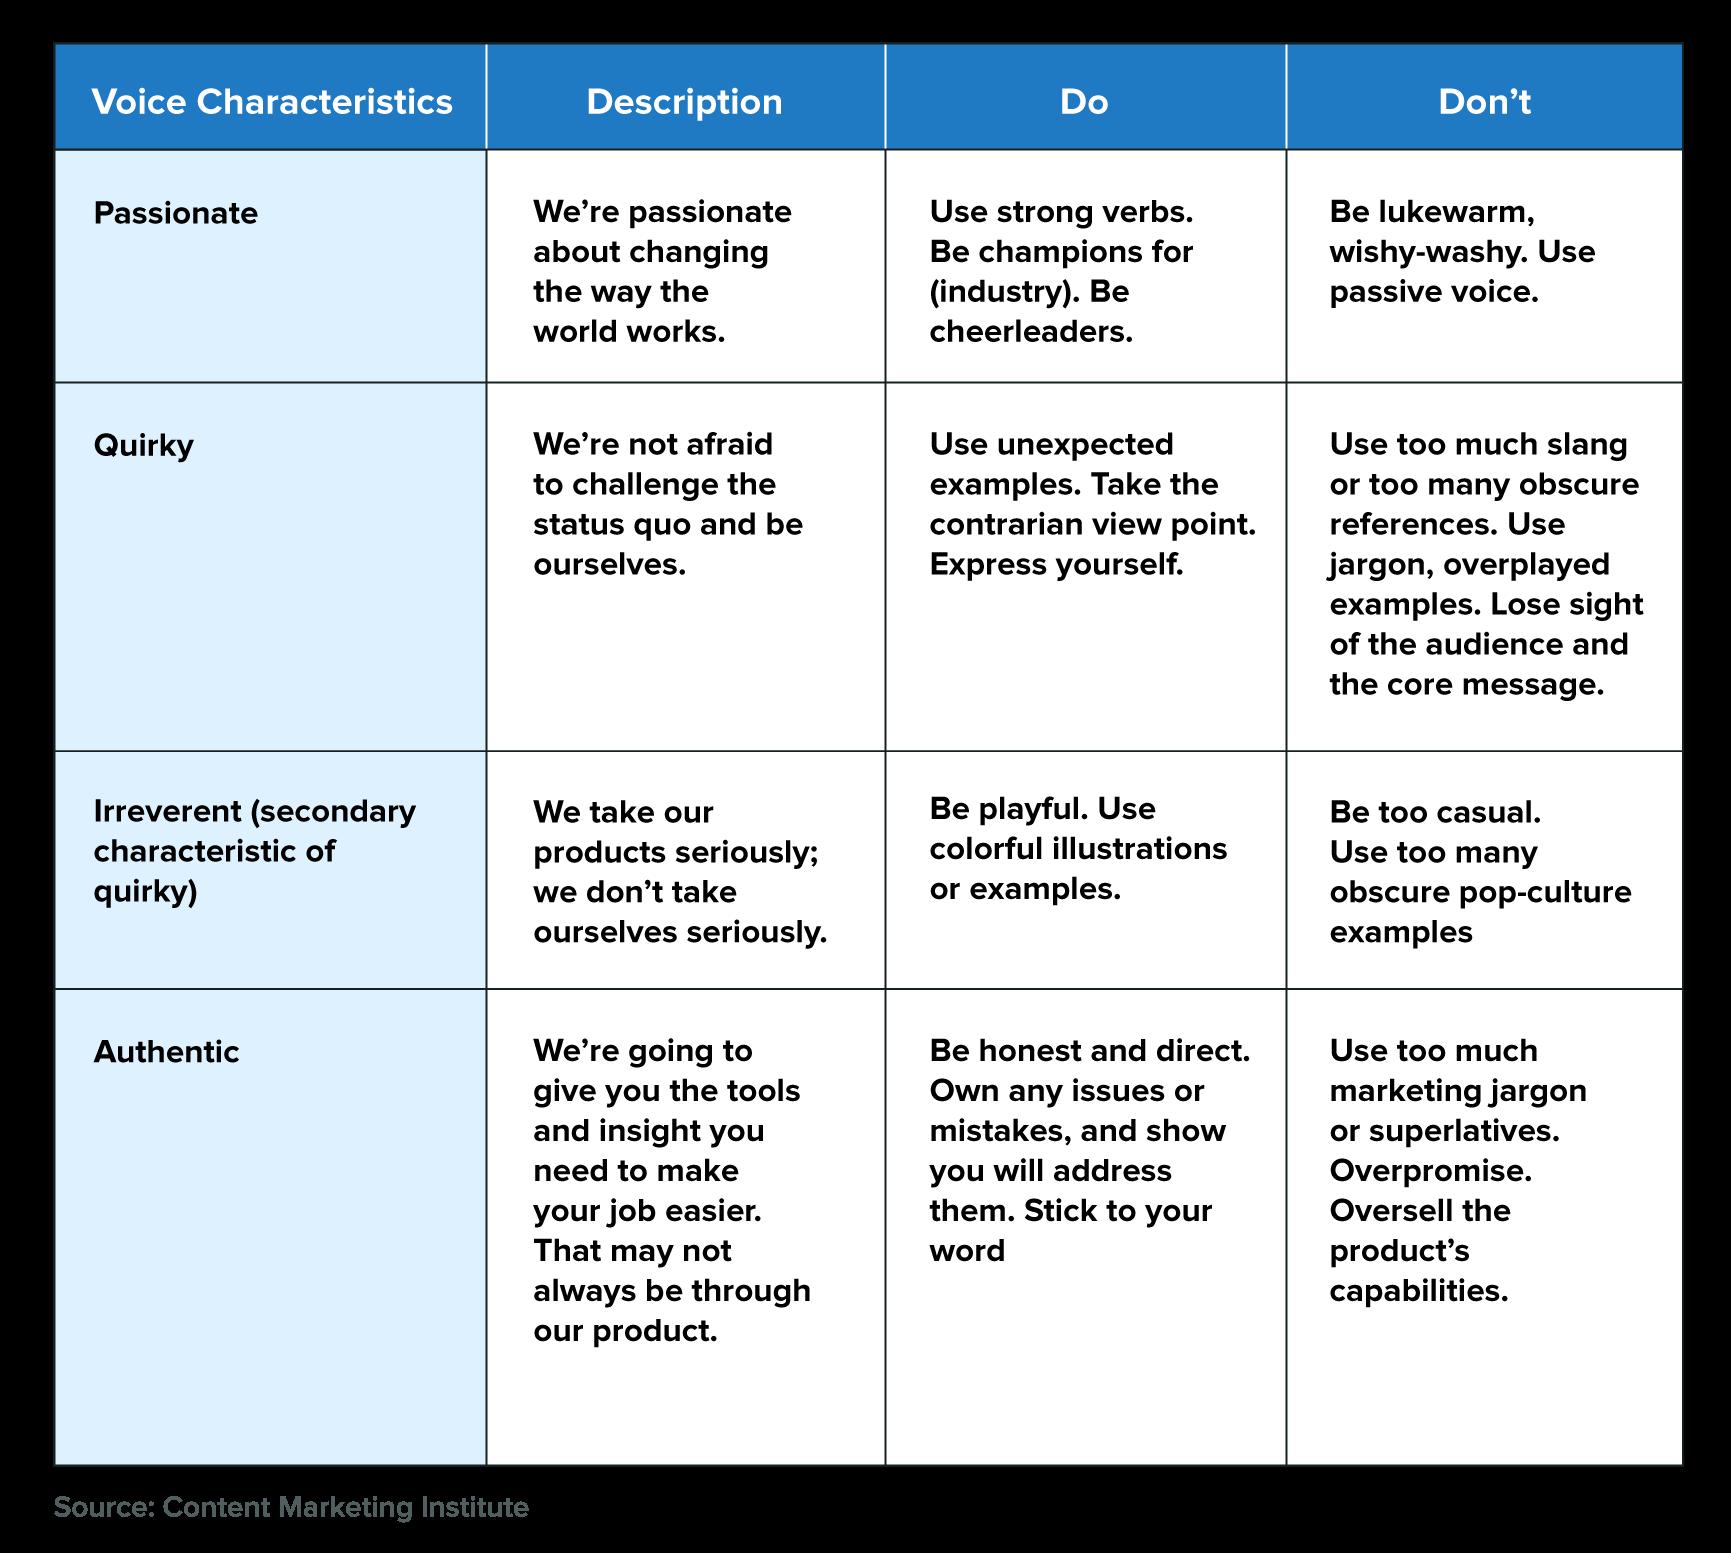 voice-characteristics_2x.png